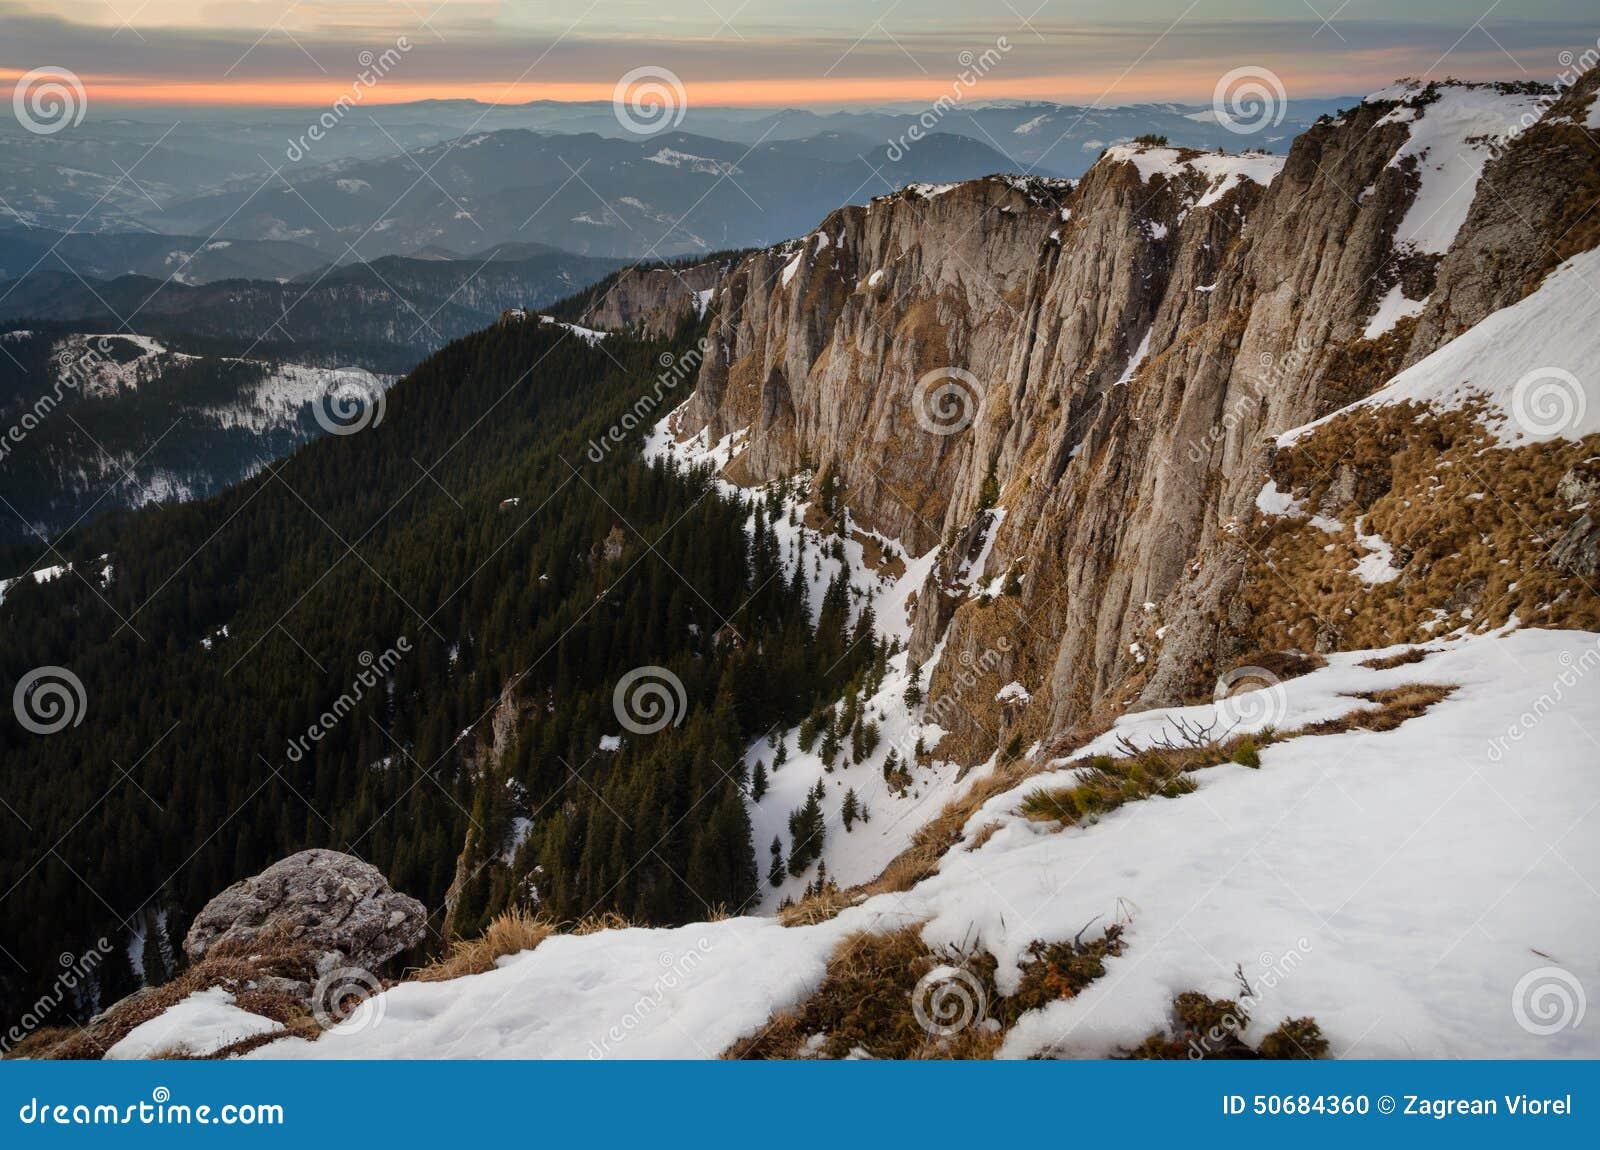 Download 与雪和蓝天的山风景 库存照片. 图片 包括有 全景, 旅行, 季节, 小山, 天空, 蓝色, 空白, 横向 - 50684360